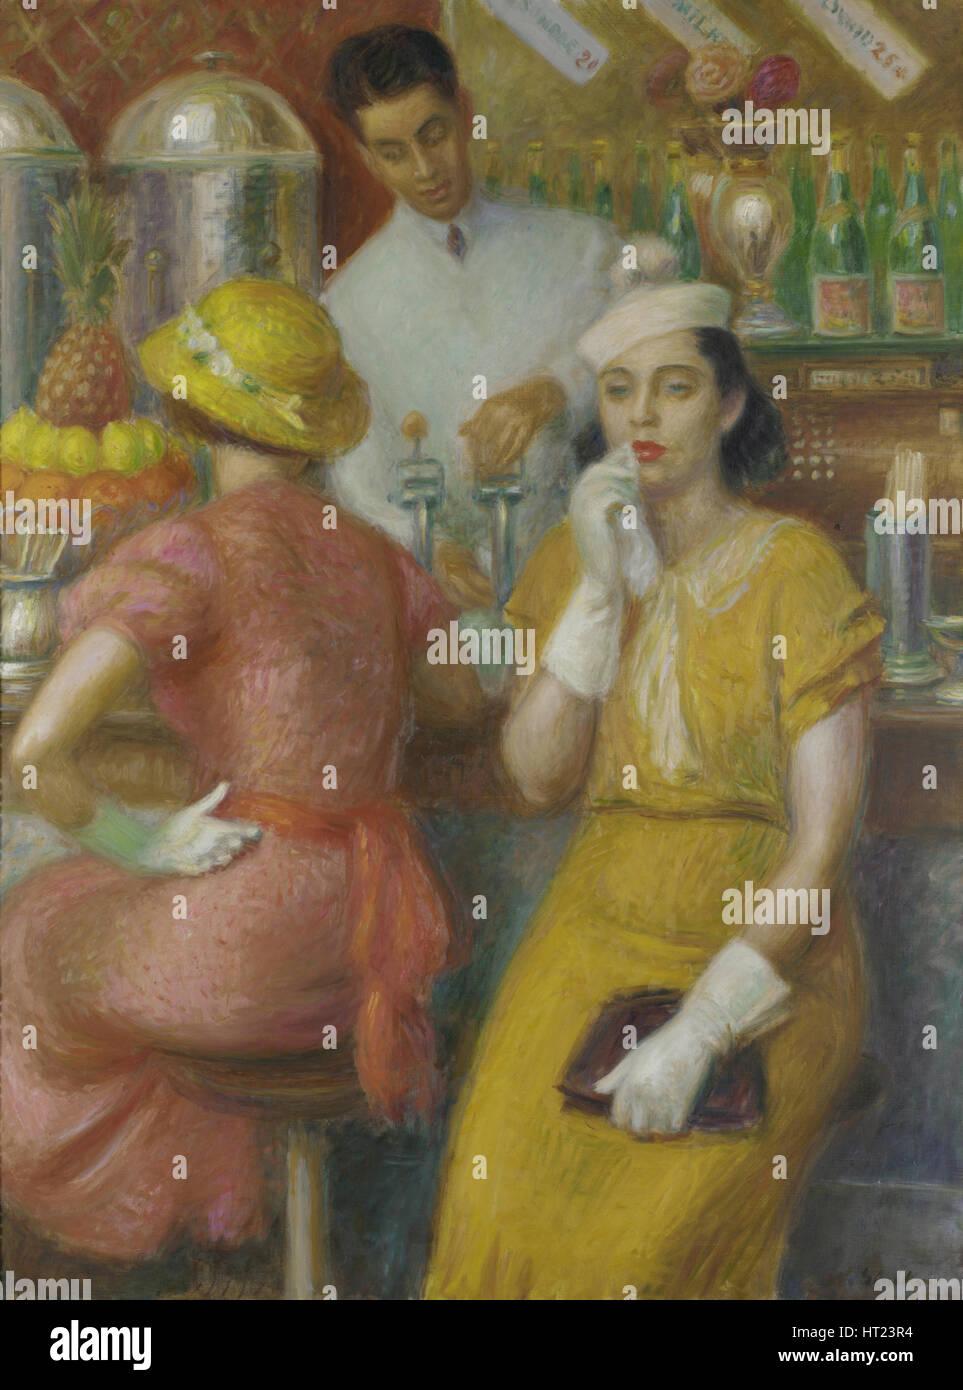 The Soda Fountain, 1935. Artist: Glackens, William James (1870-1938) - Stock Image